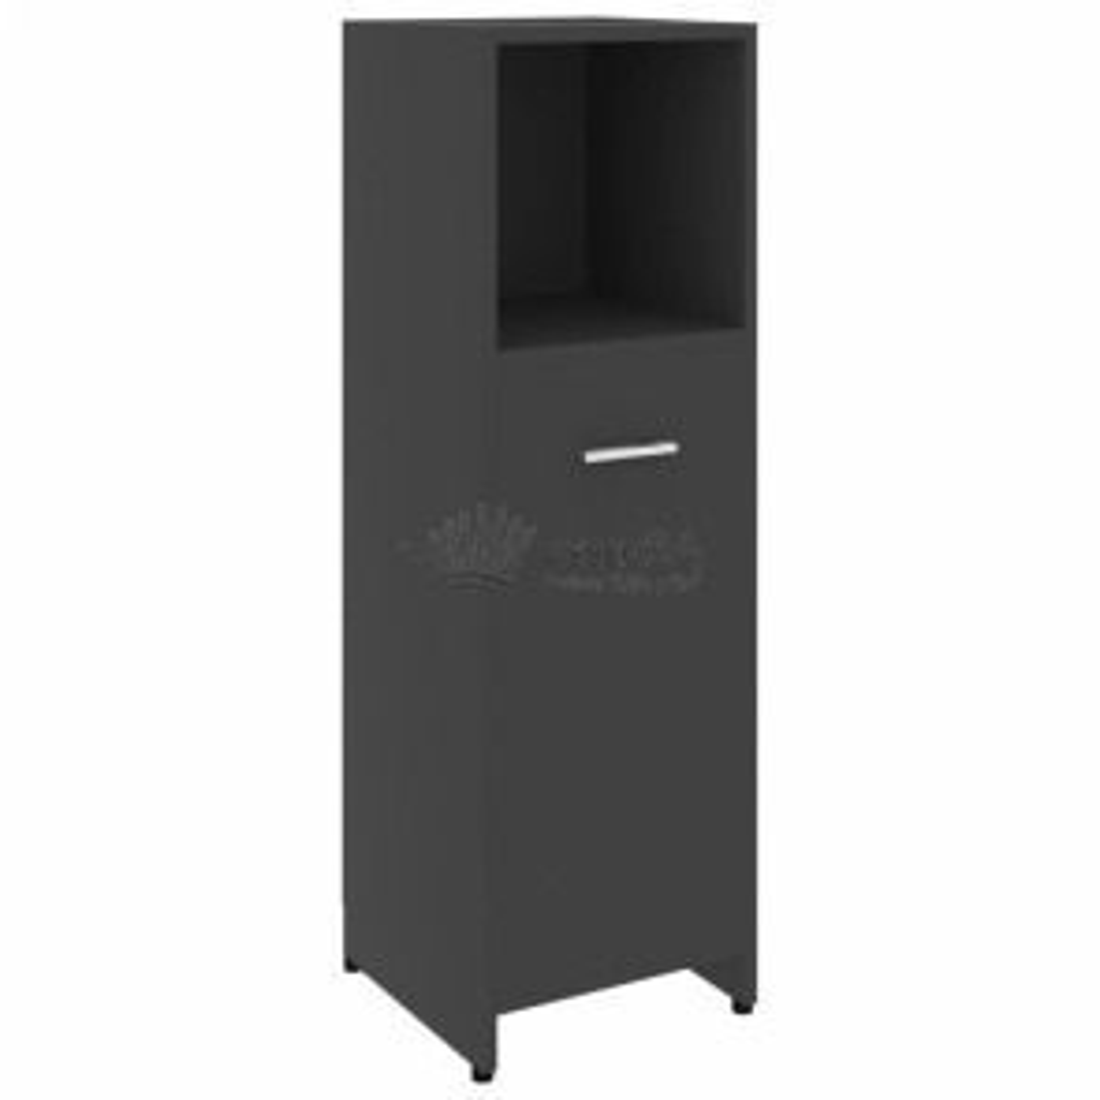 vidaXL Koupelnová skříňka šedá 30 x 30 x 95 cm dřevotříska [802590]